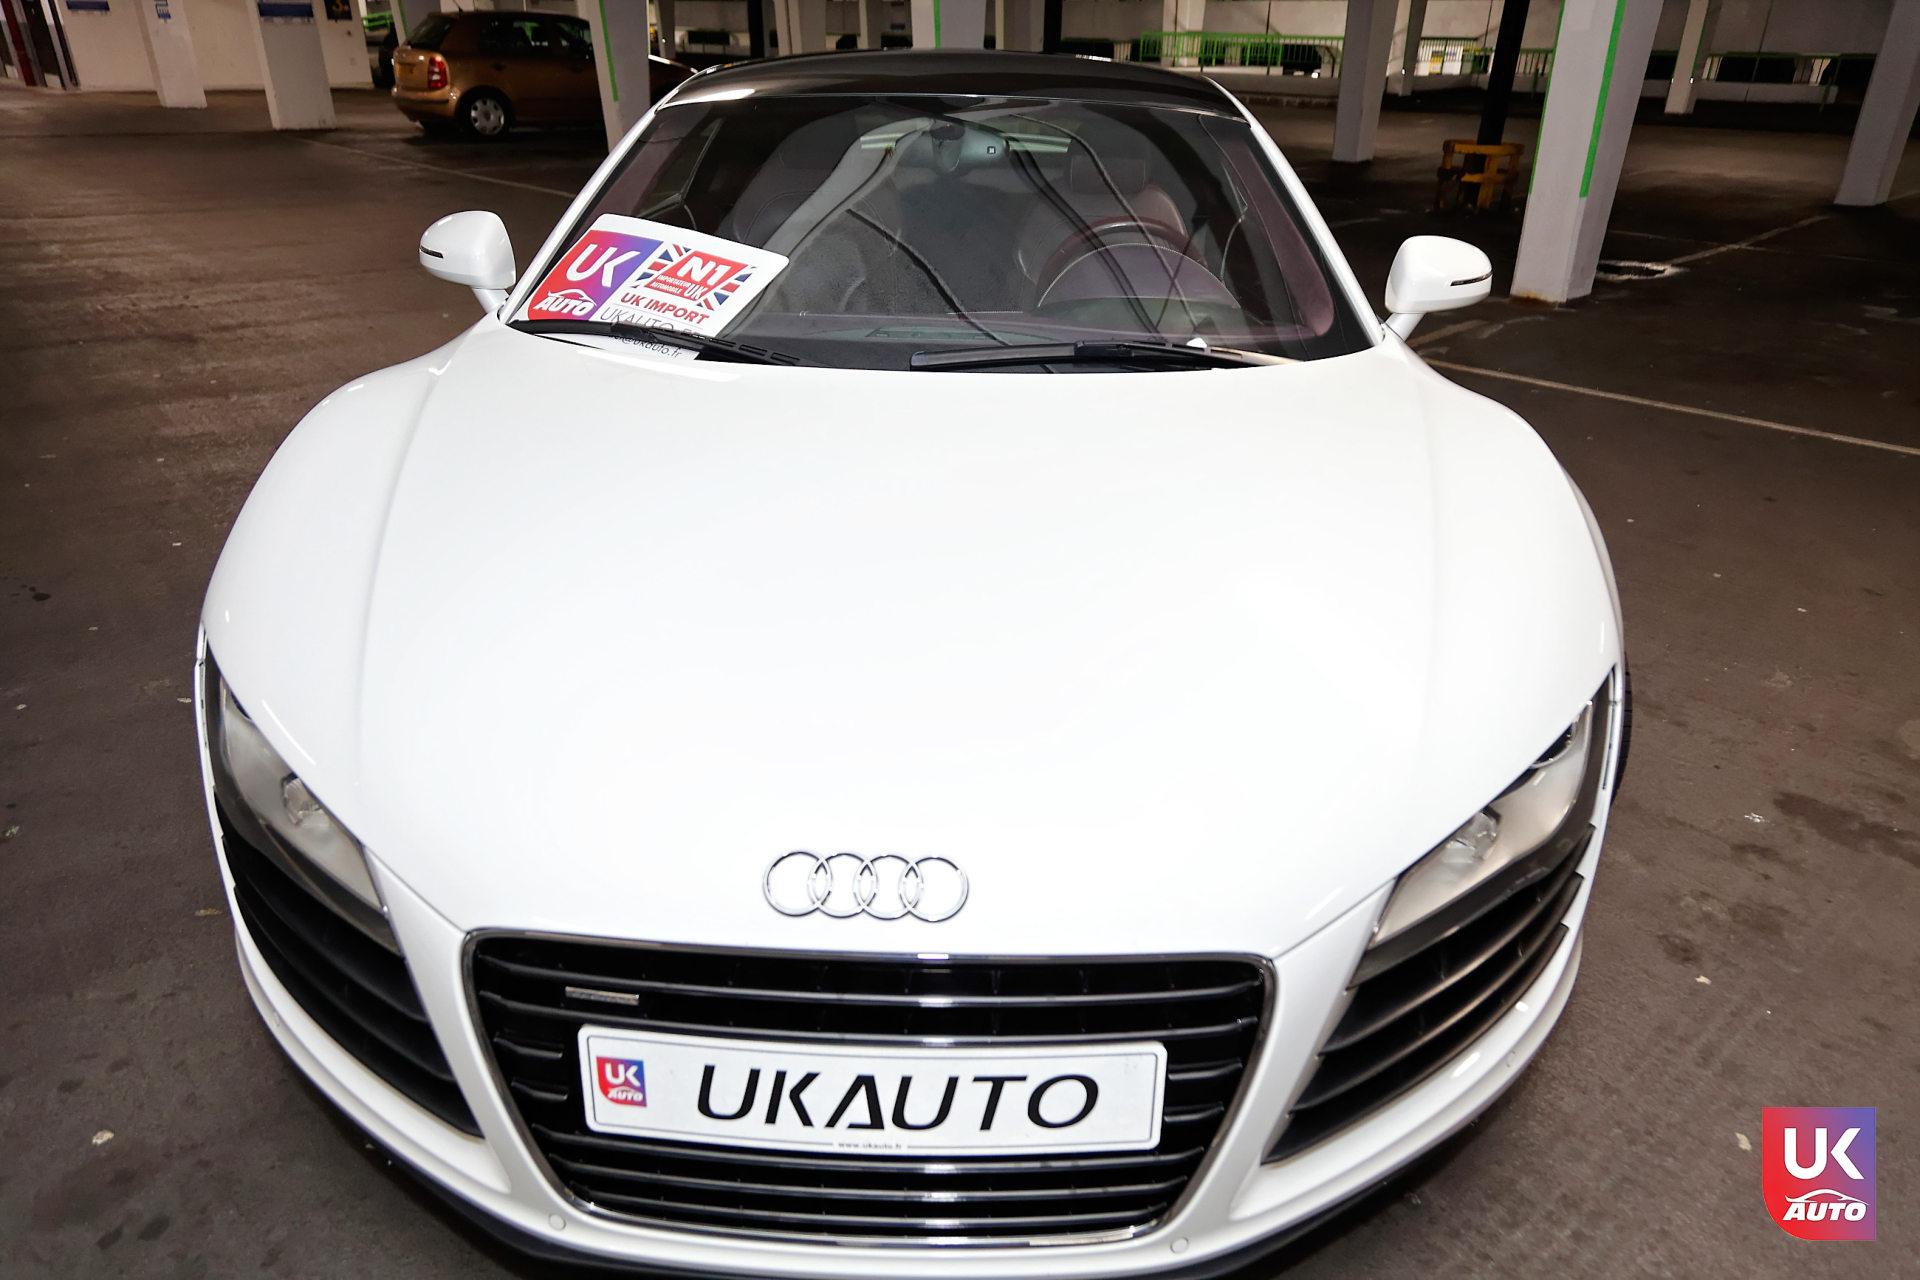 Audi R8 Import audi r8 lhd angleterre audi R8 V8 TFSI AUDI uk importation audi LHD volant a gauche11 DxO - AUDI R8 ANGLETERRE IMPORTATION AUDI R8 UK IMPORT SUPERCAR FELICITATION A CHARLES POUR CET IMPORT